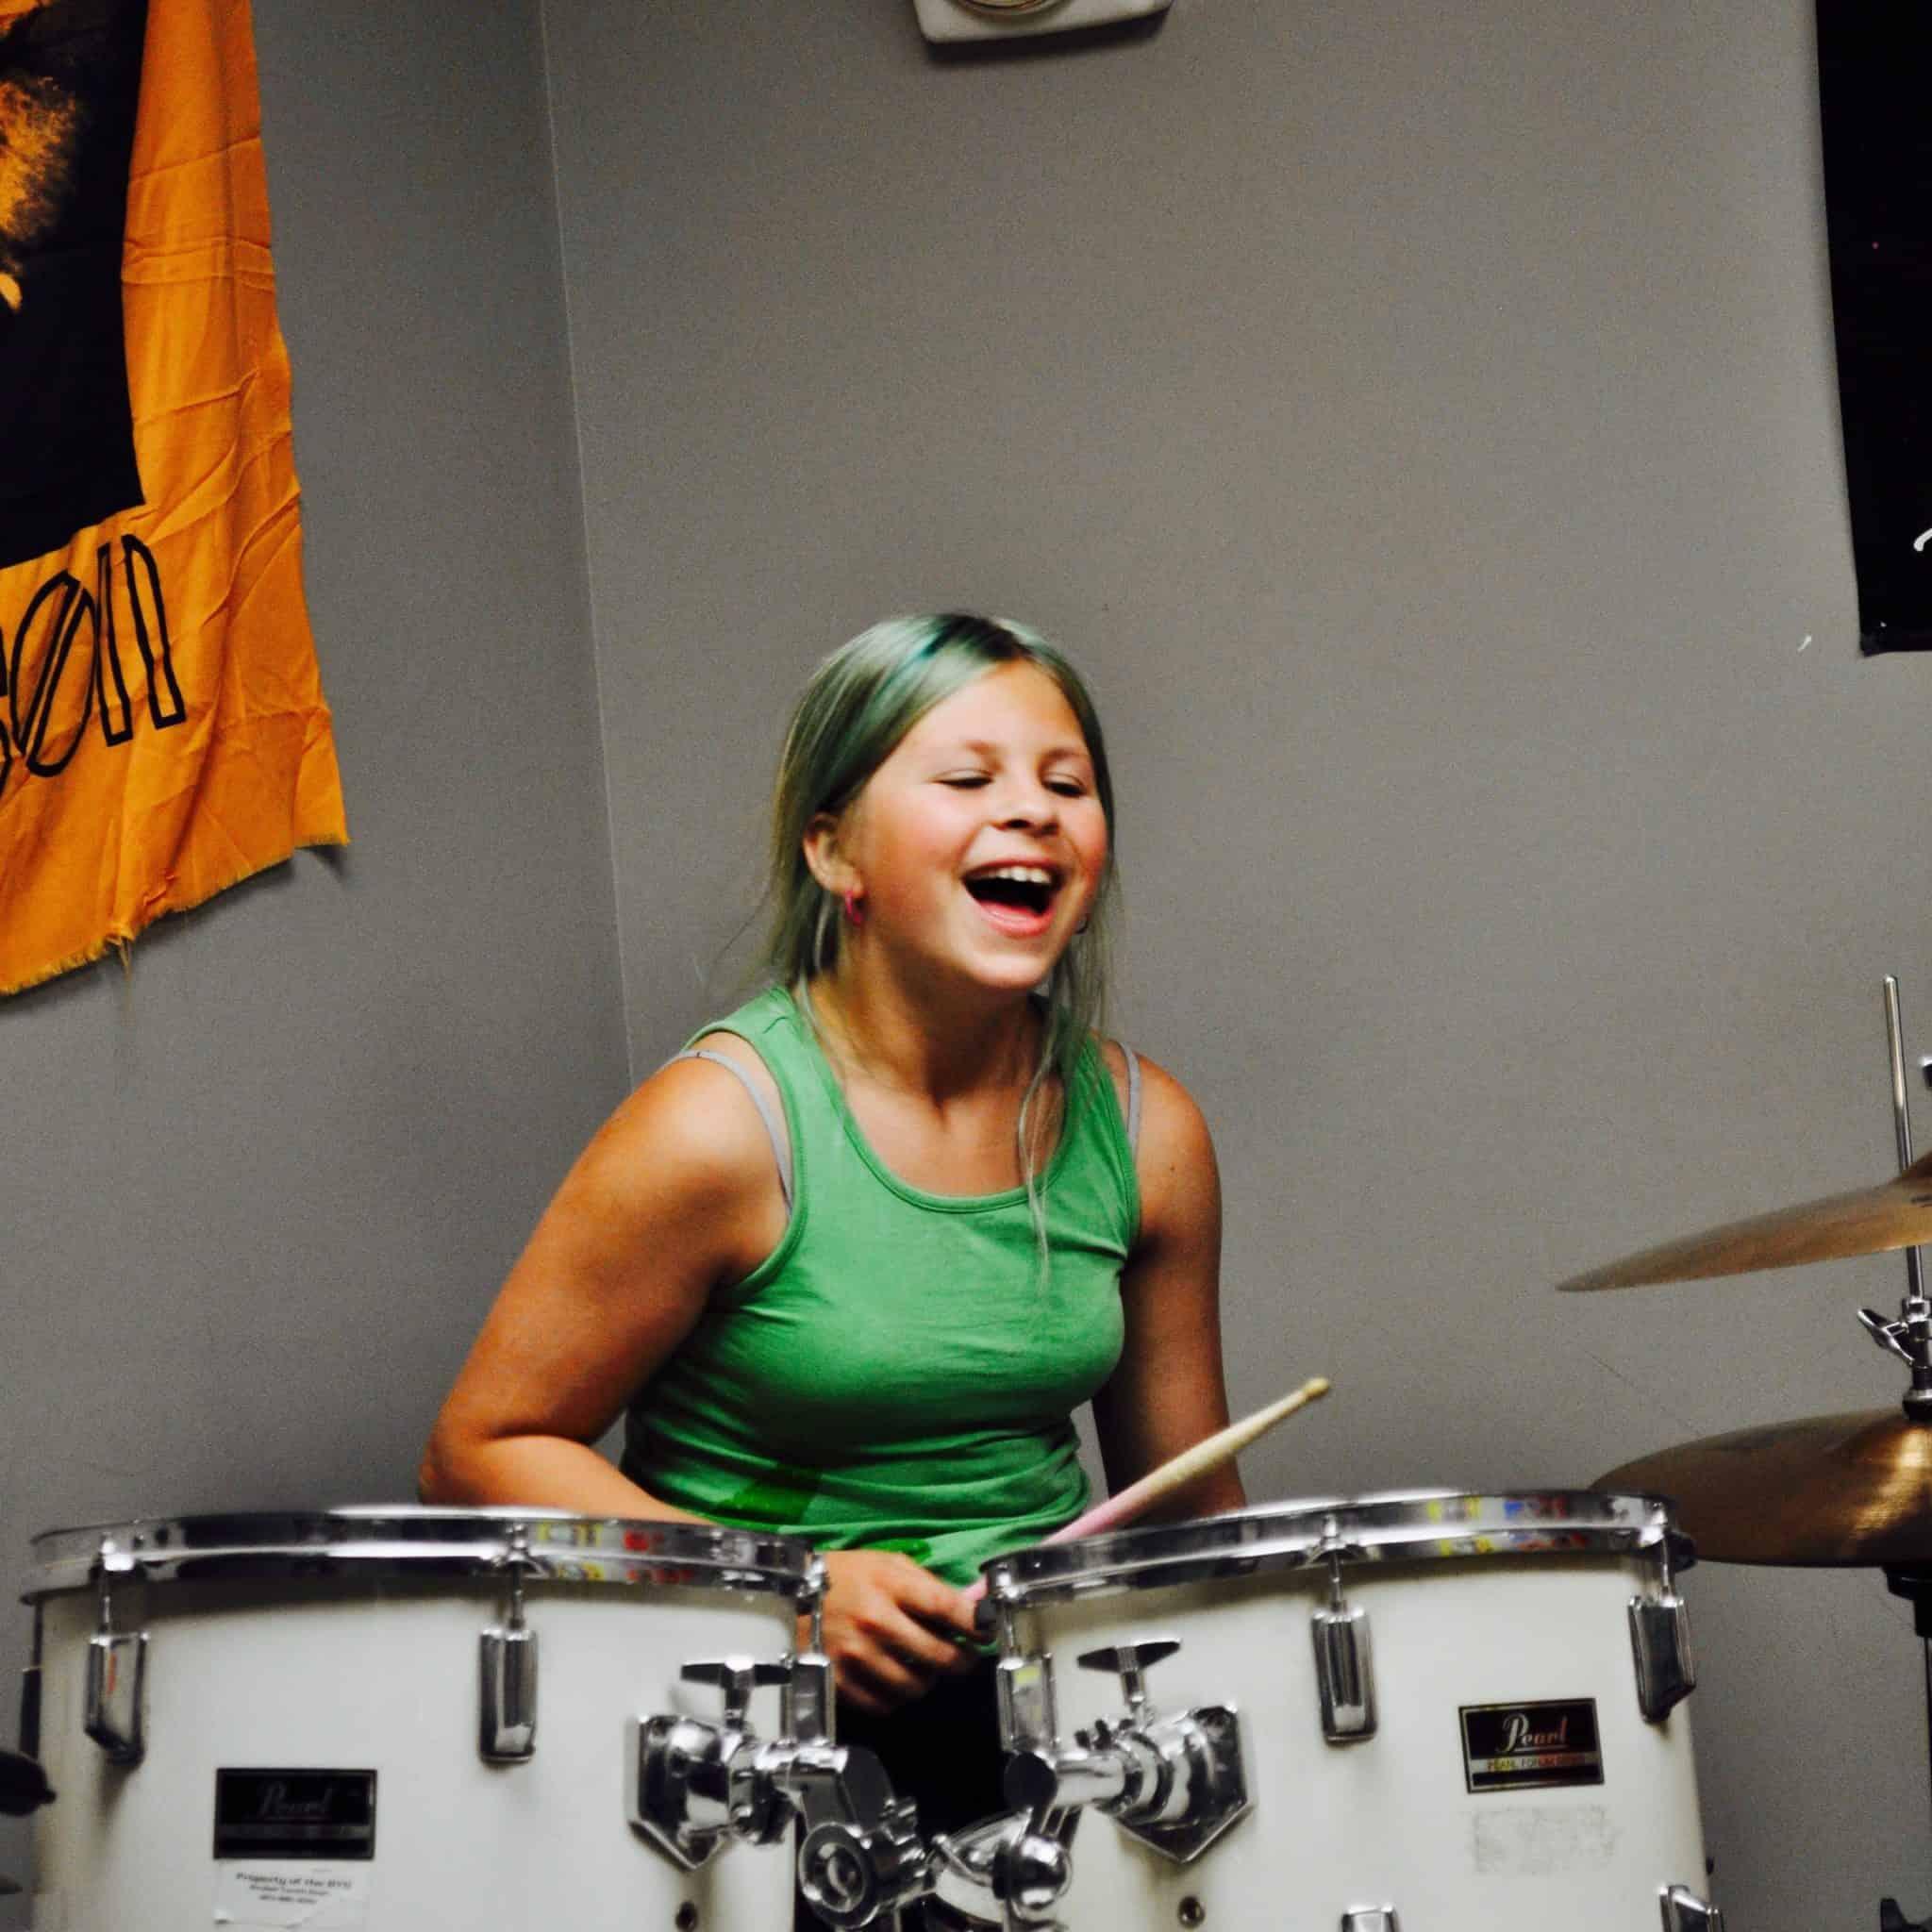 Drum Lessons Edmonton, With Damien